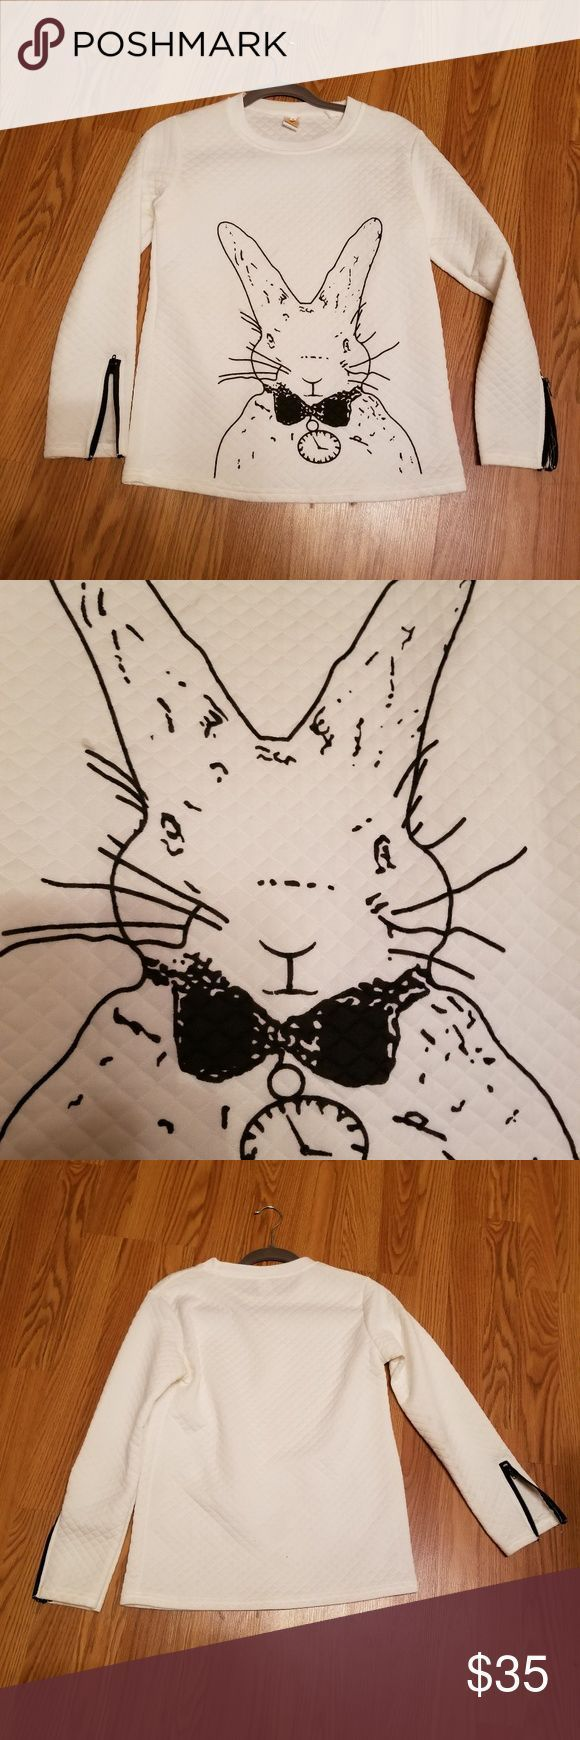 Long sleeves top Alice wonder land rabbit long sleeves top. boutique Tops – #Ali